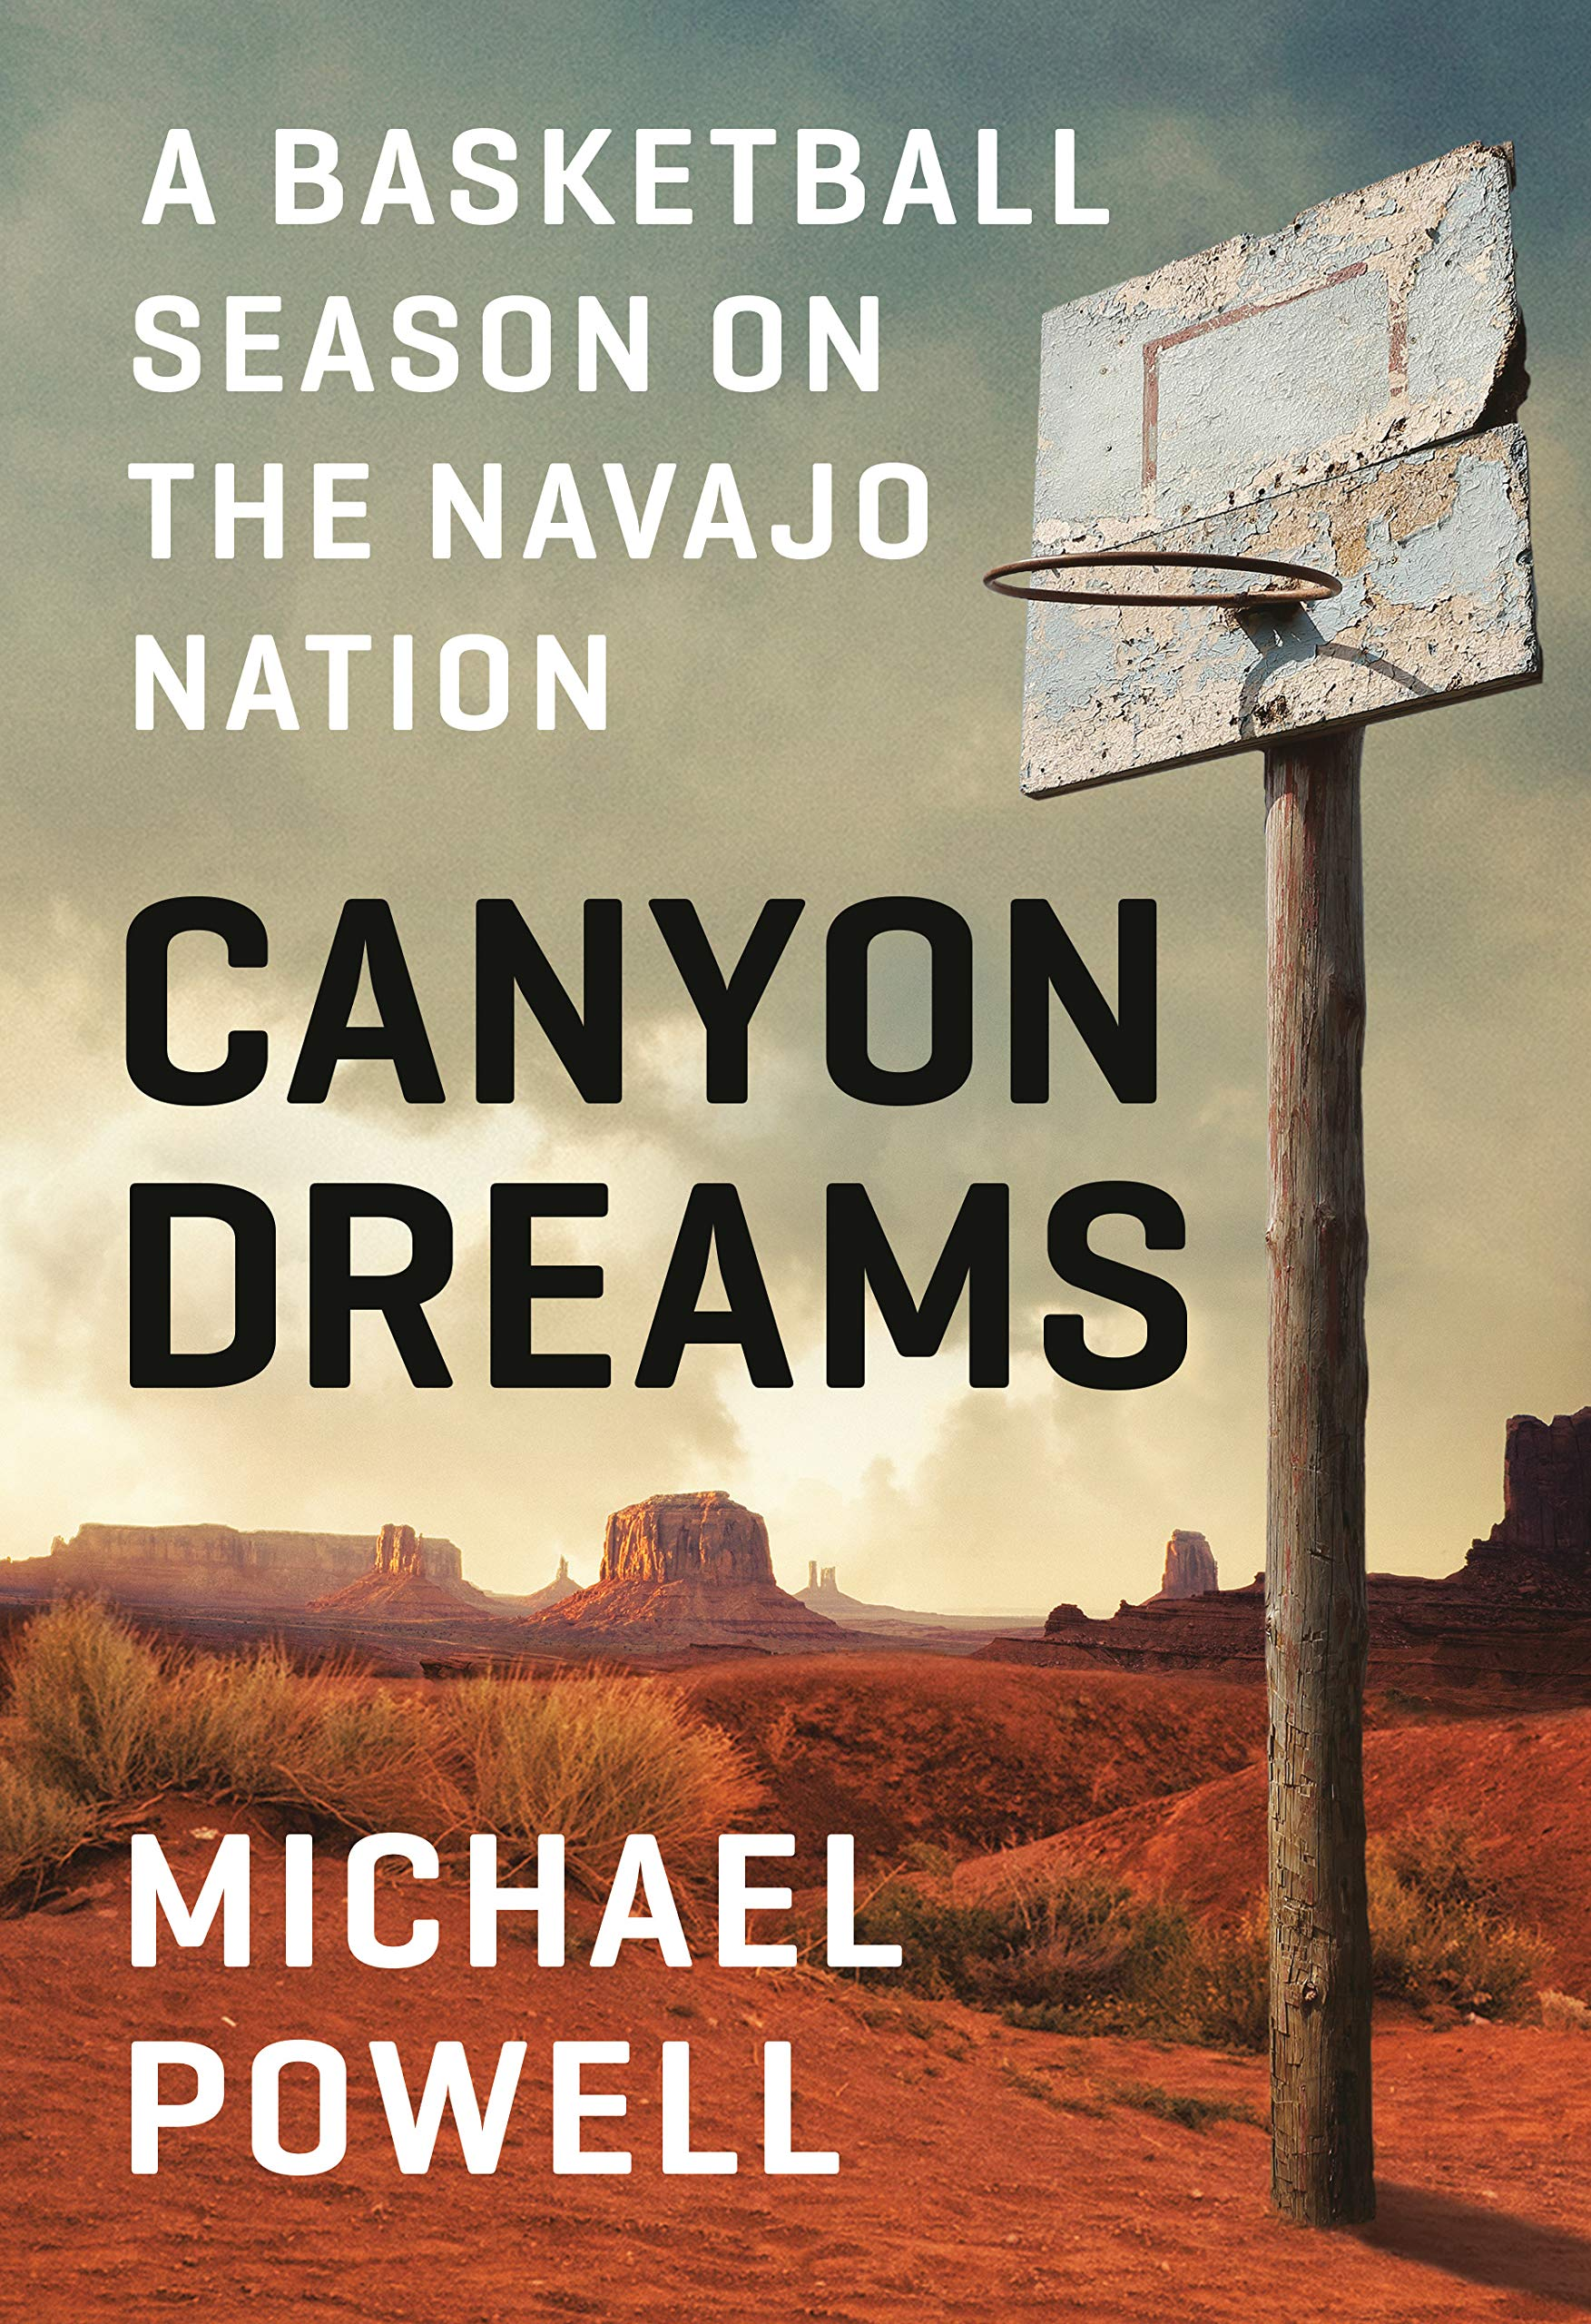 f5e086a29b0 Canyon Dreams  A Basketball Season on the Navajo Nation Hardcover –  November 19